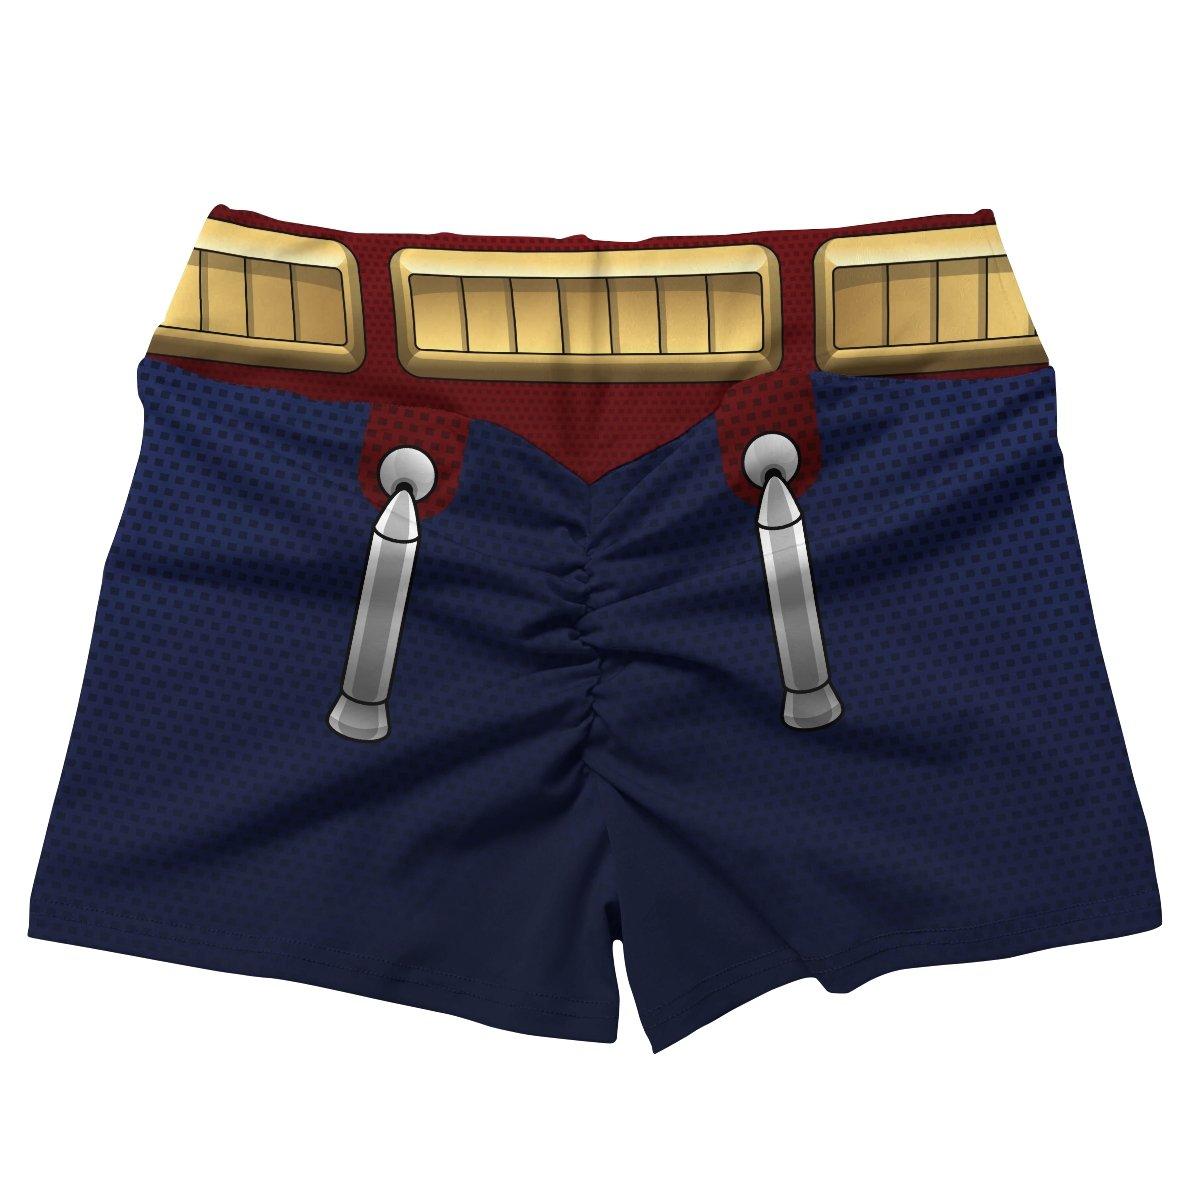 ua high shoto active wear set 736067 - Anime Swimsuits